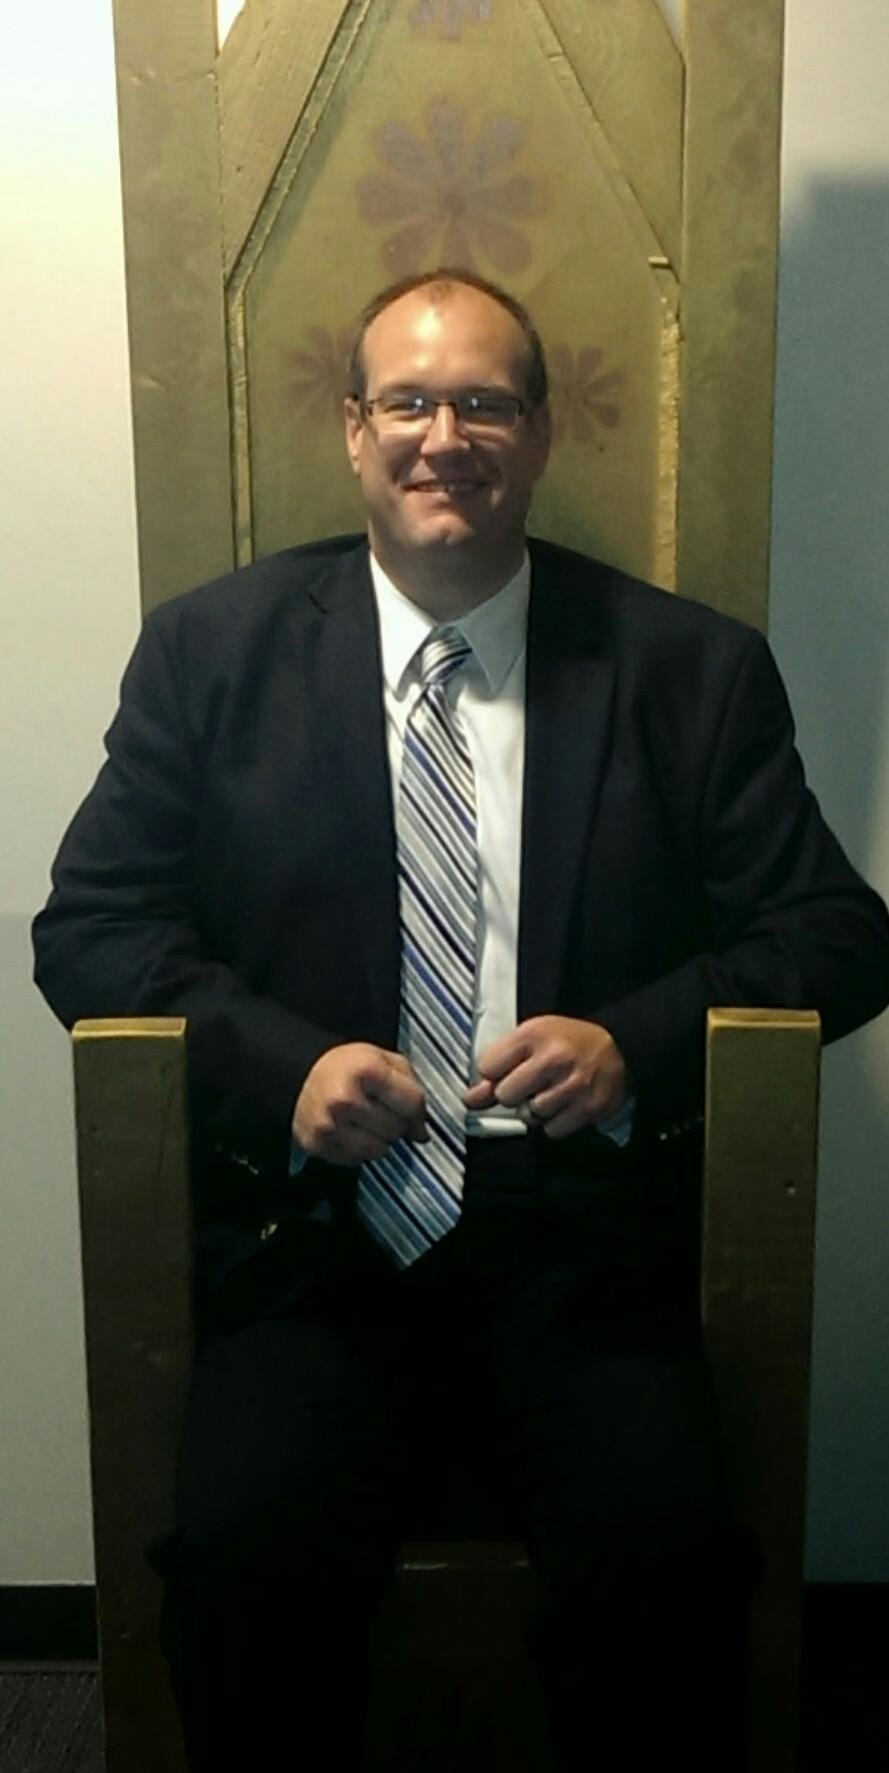 RONALD JASON SOWARDS Financial Professional & Insurance Agent